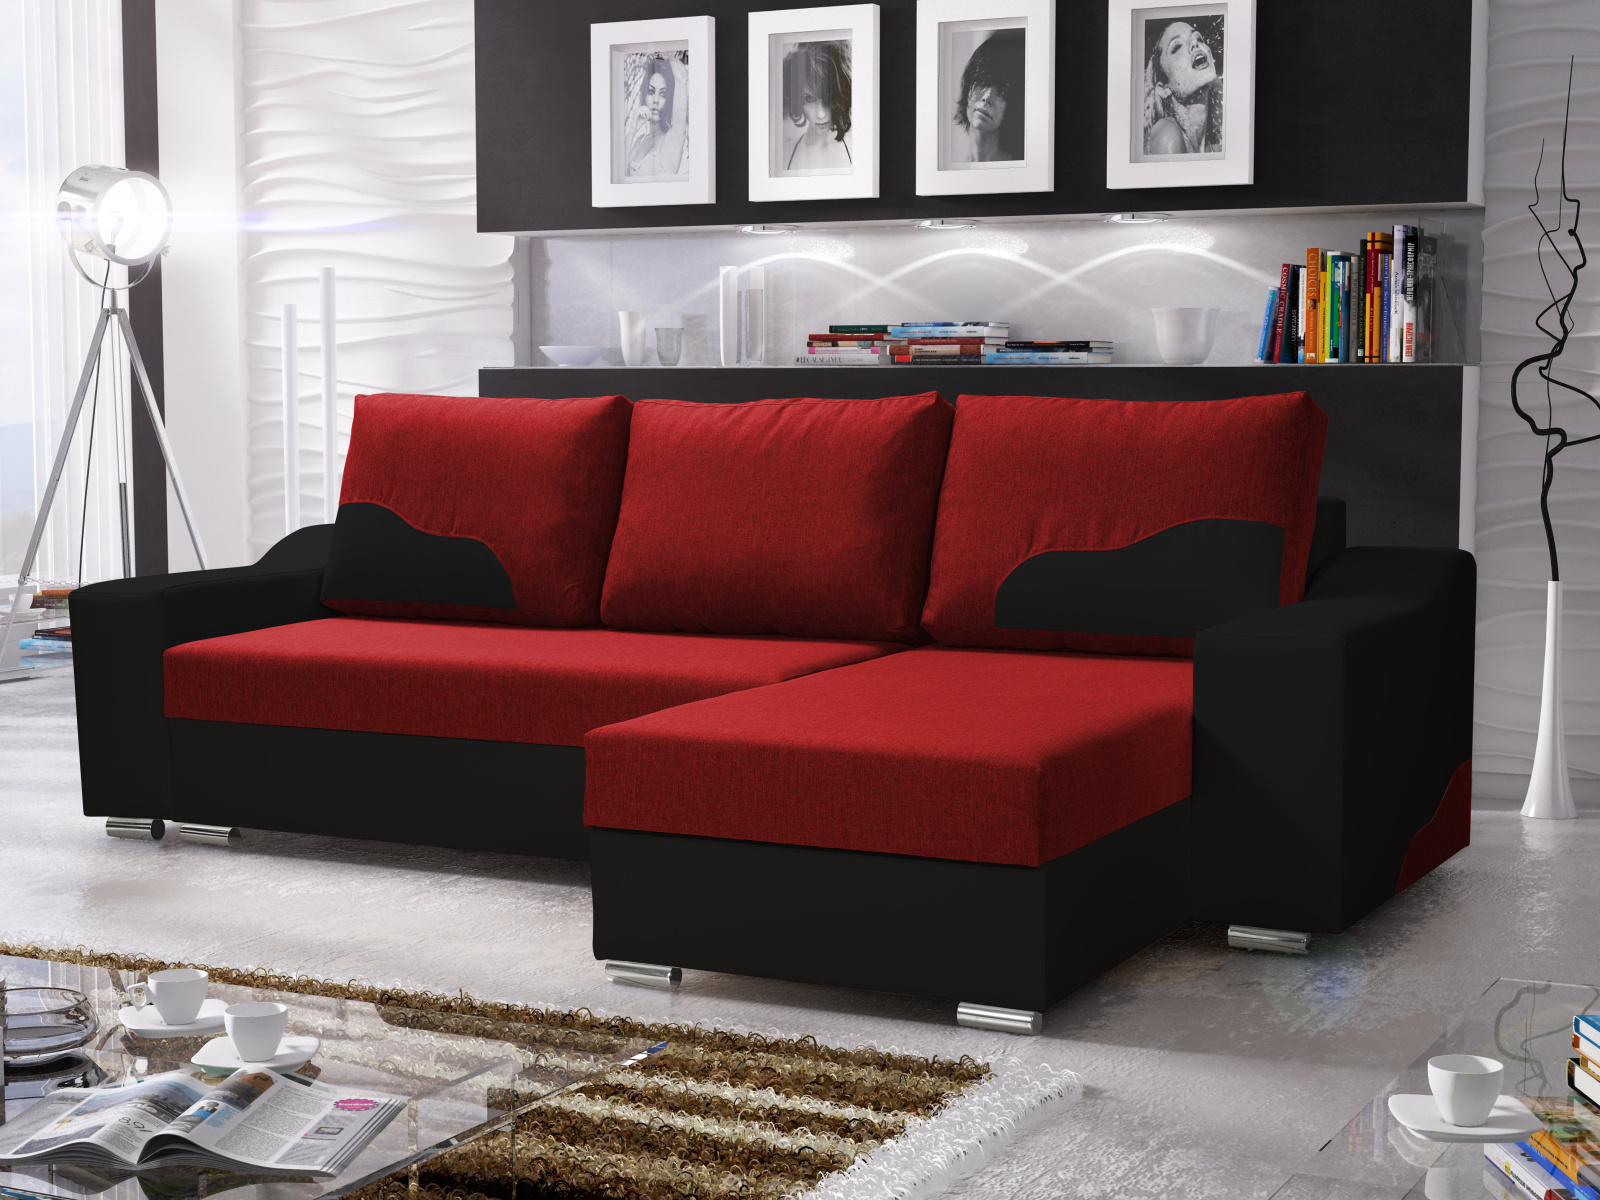 Smartshop Rohová sedačka WILLIAM 250/1, červená/černá